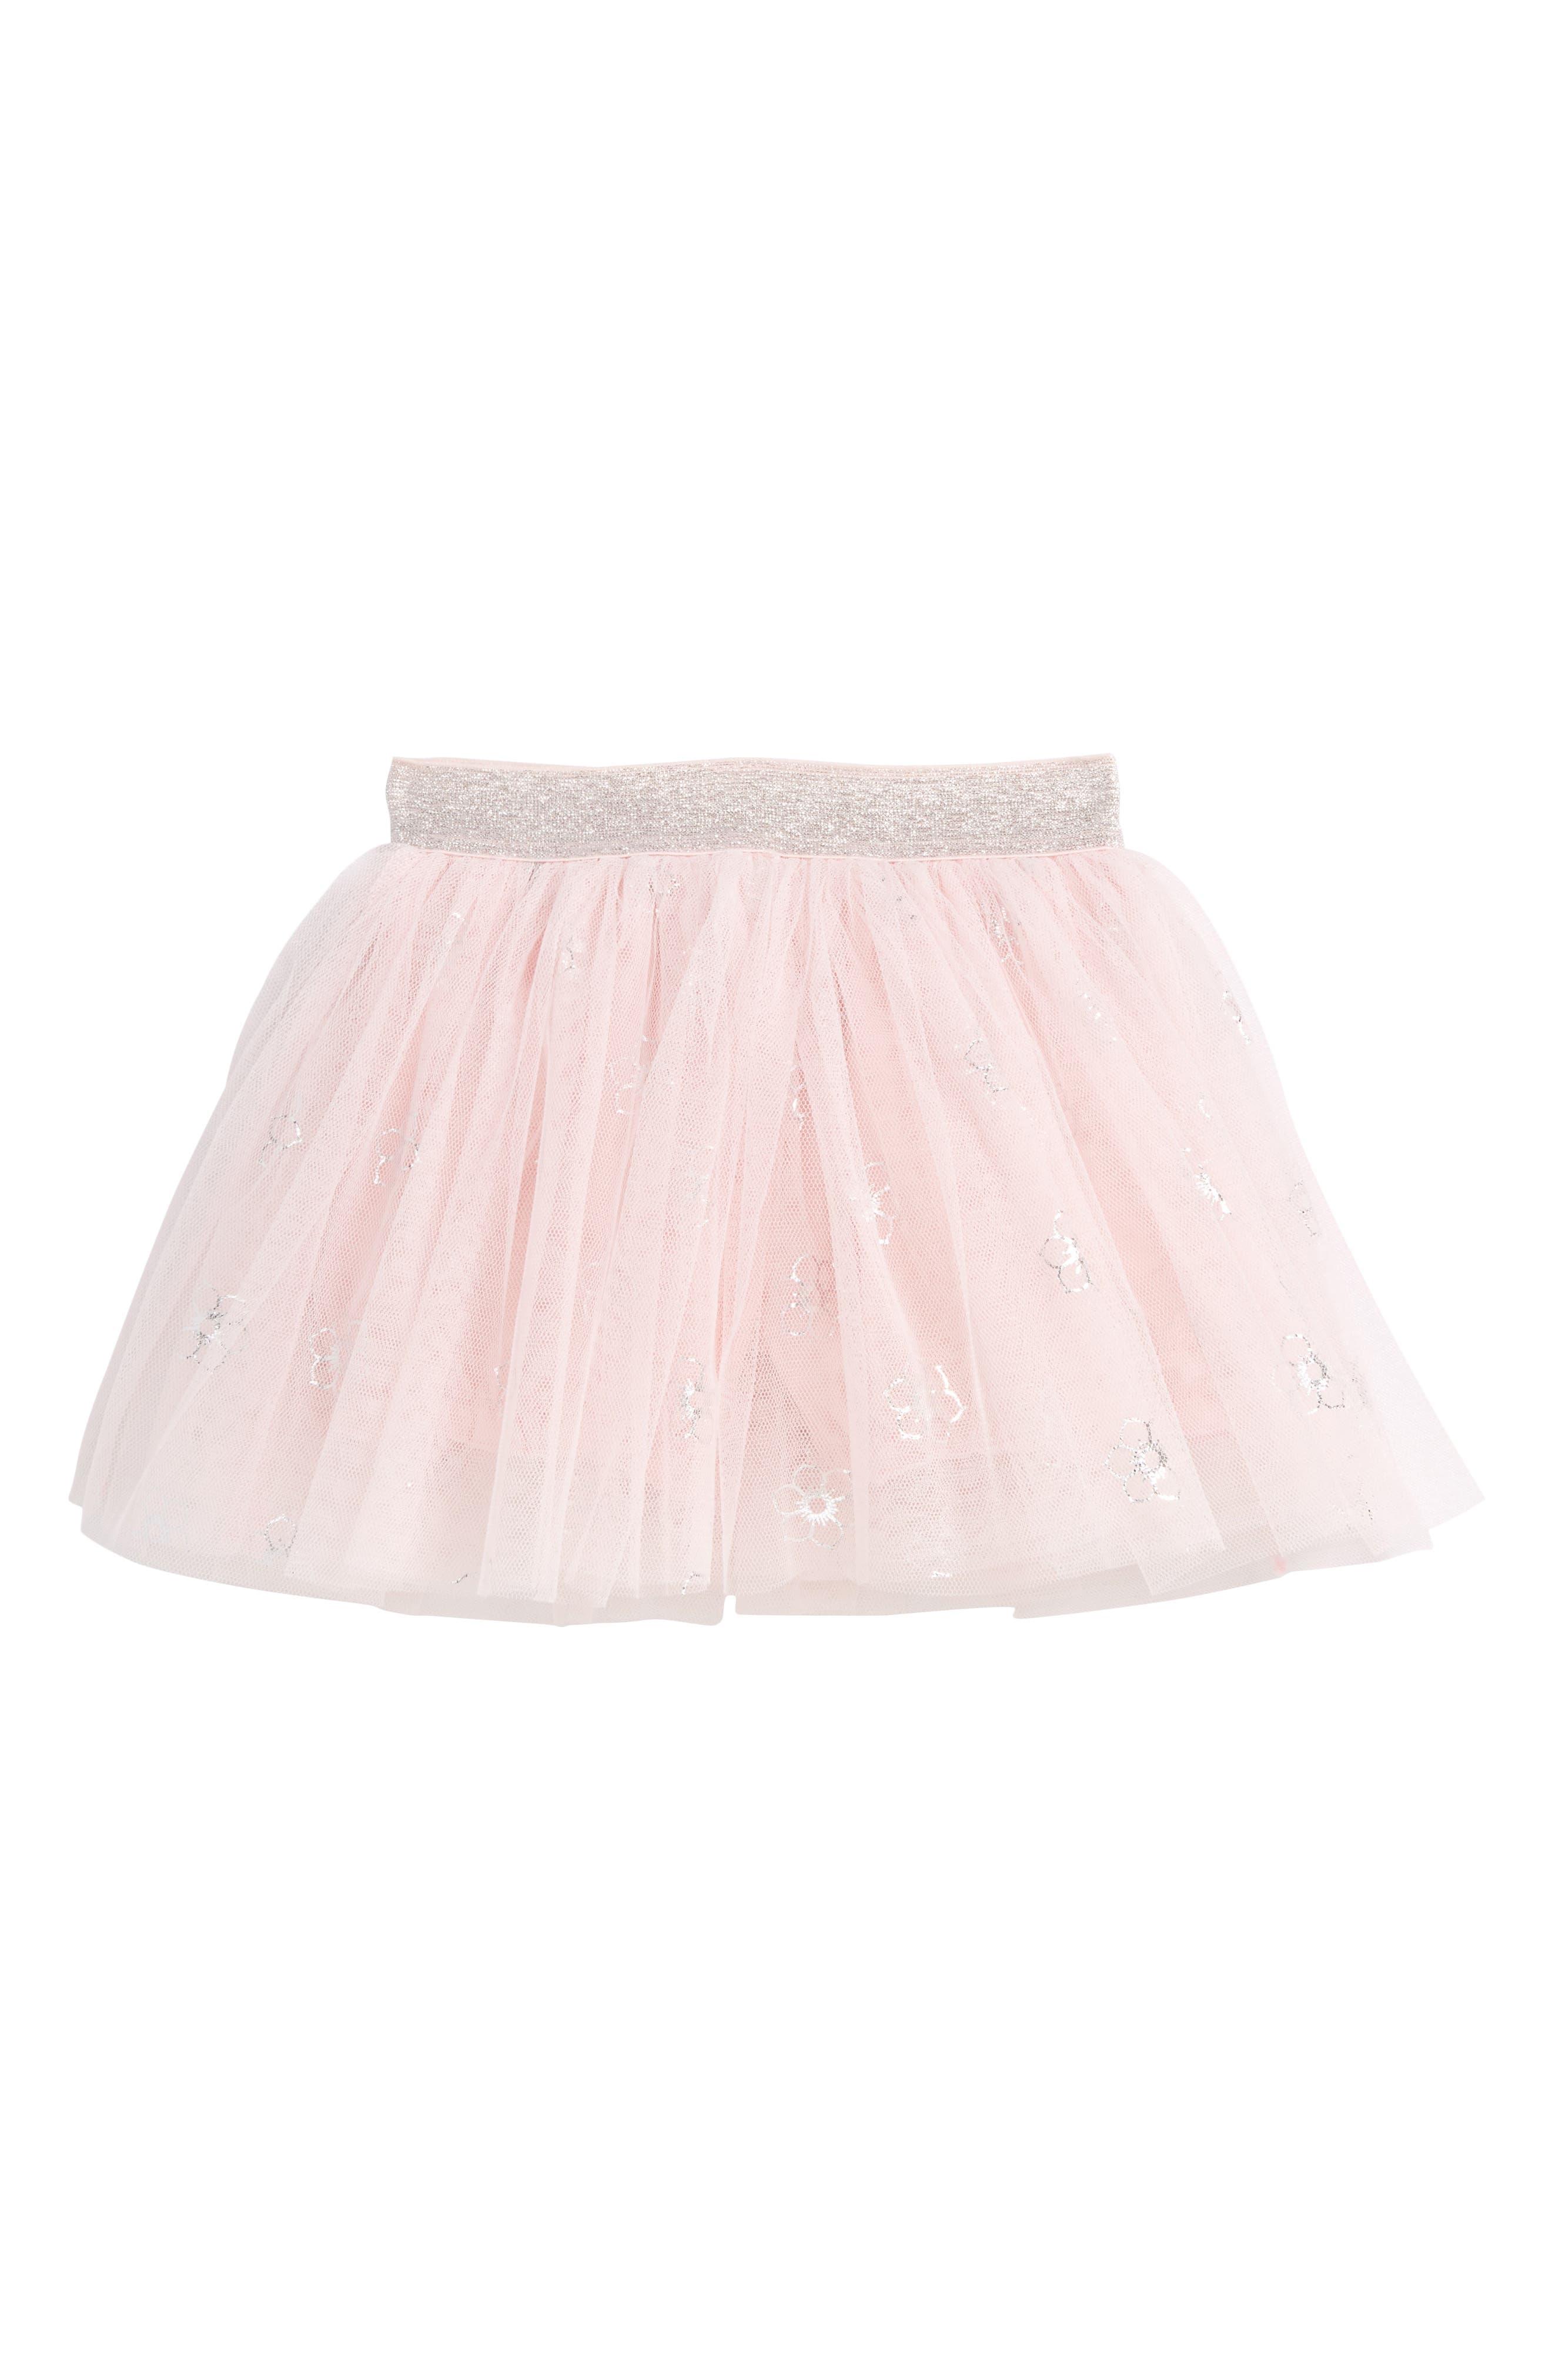 Alternate Image 1 Selected - Robeez® Tutu Skort (Baby Girls)